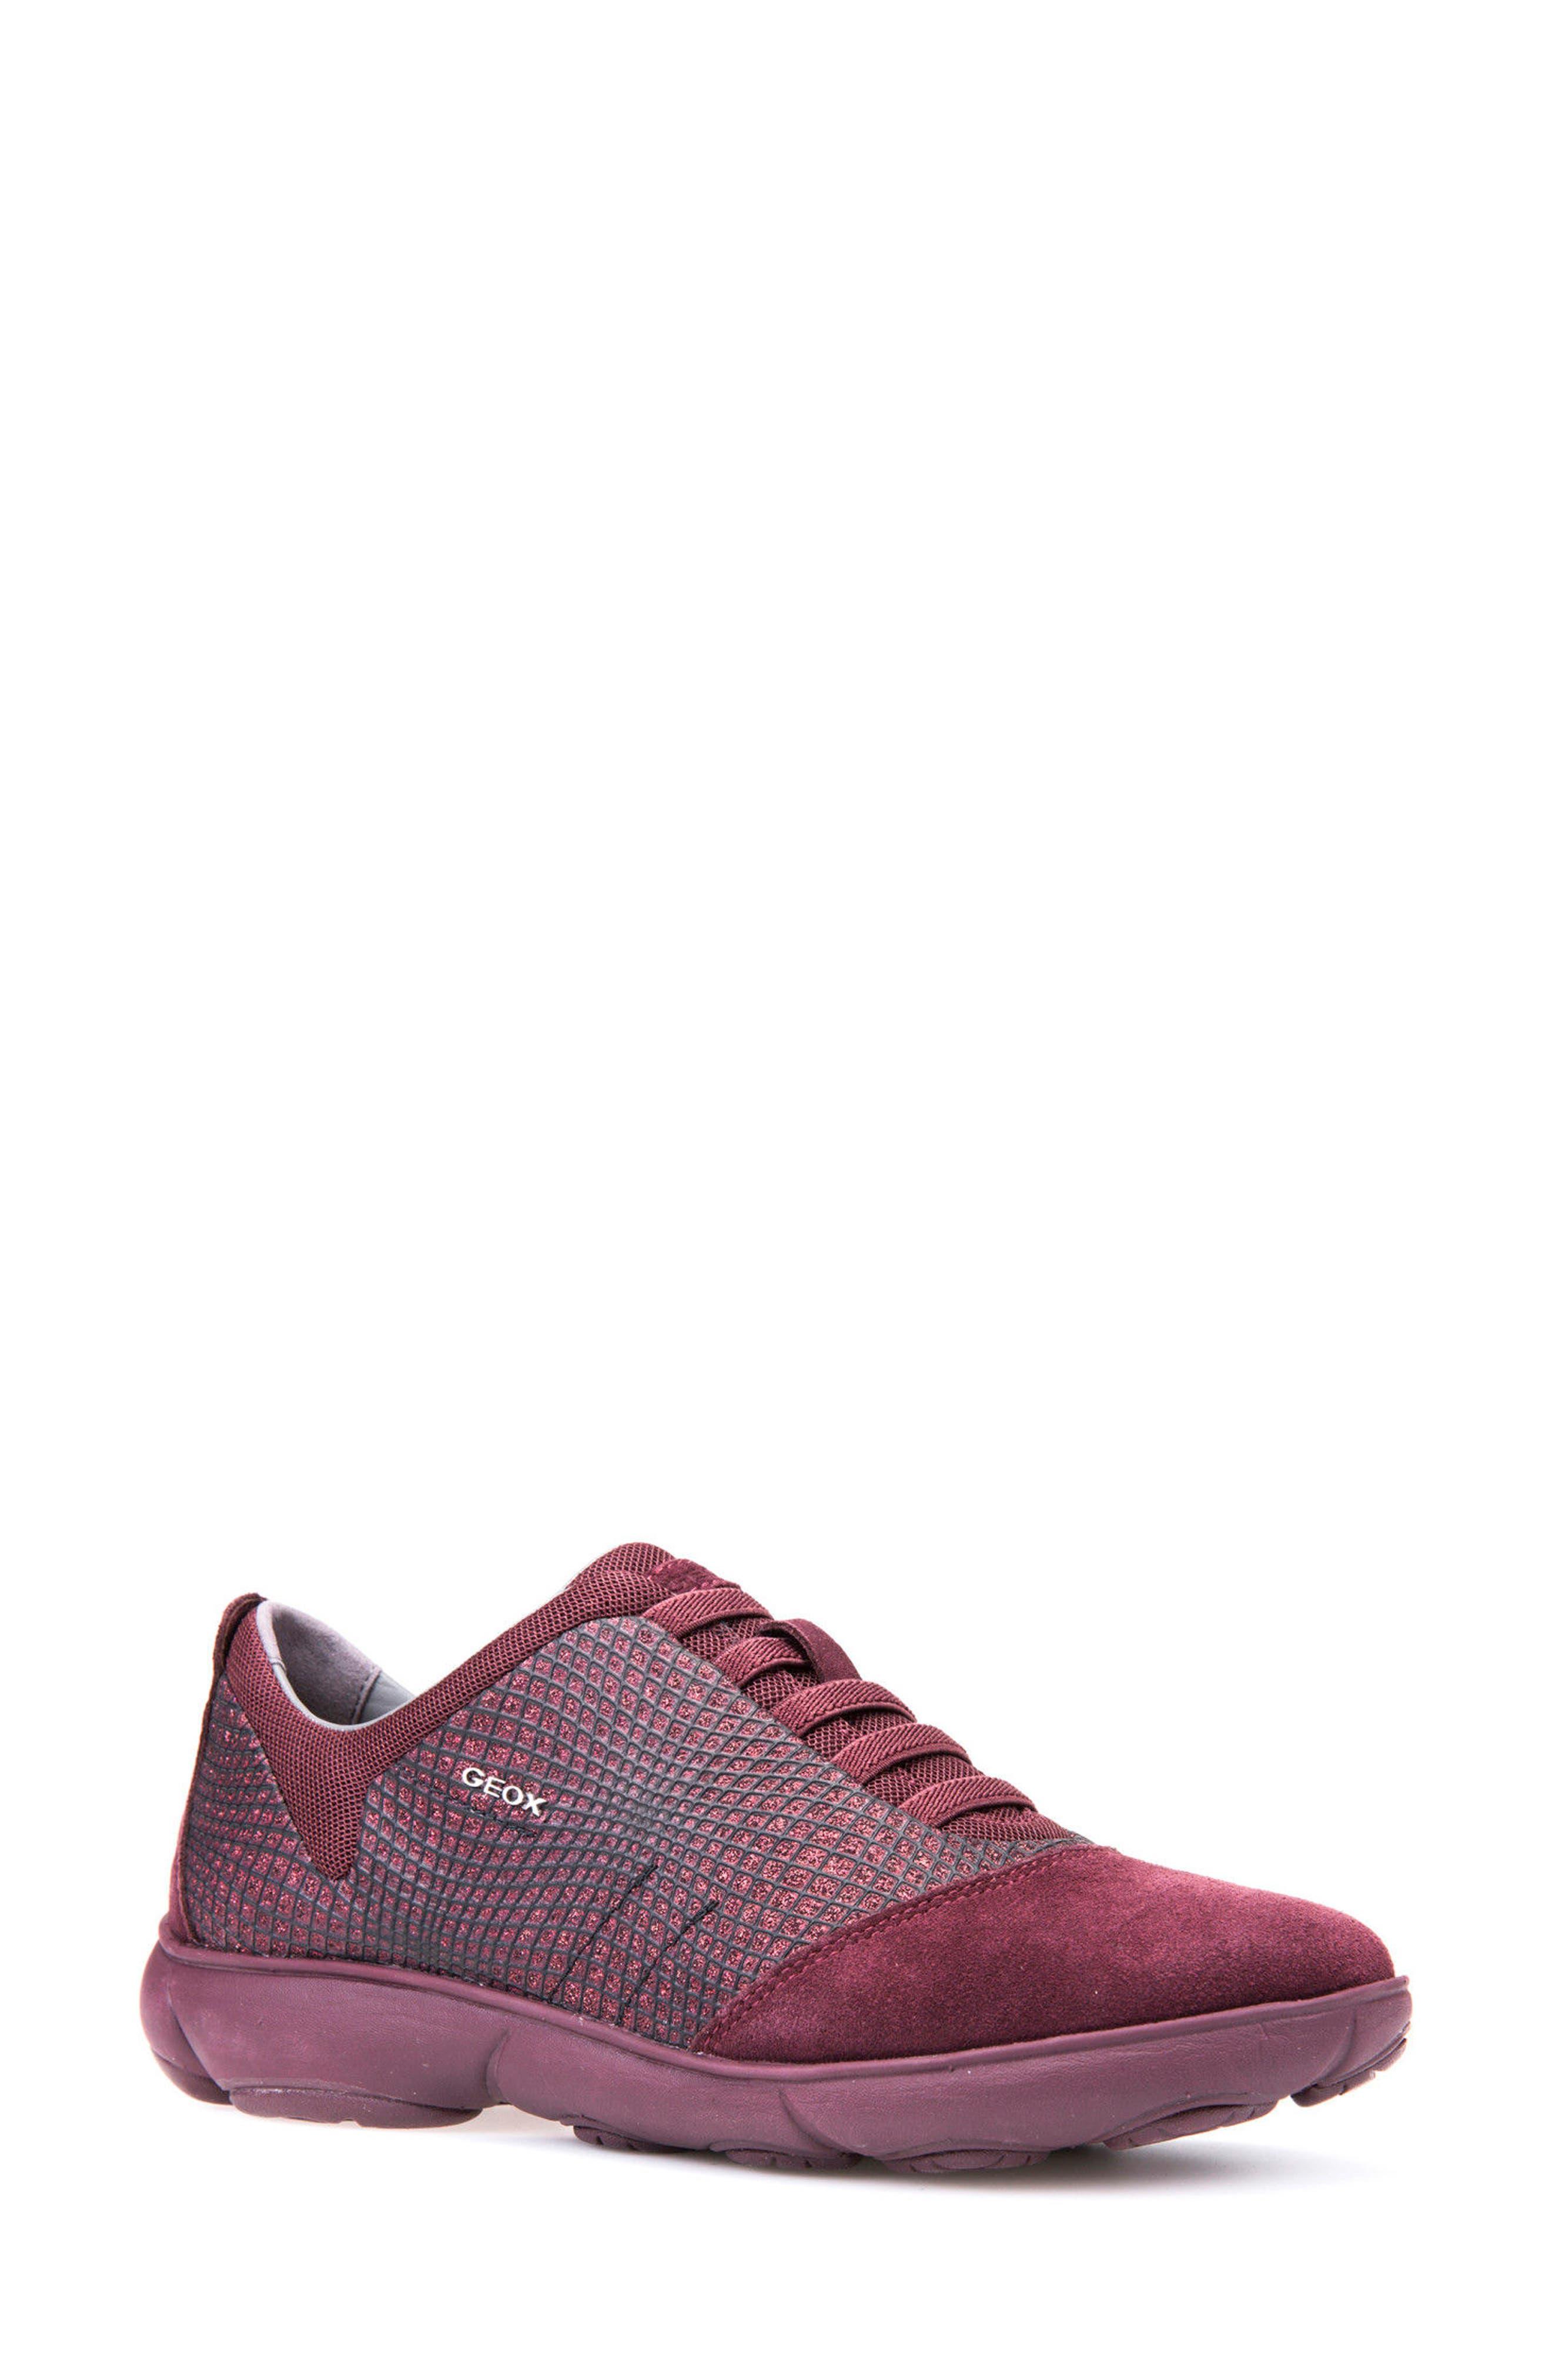 Nebula Slip-On Sneaker,                             Main thumbnail 5, color,